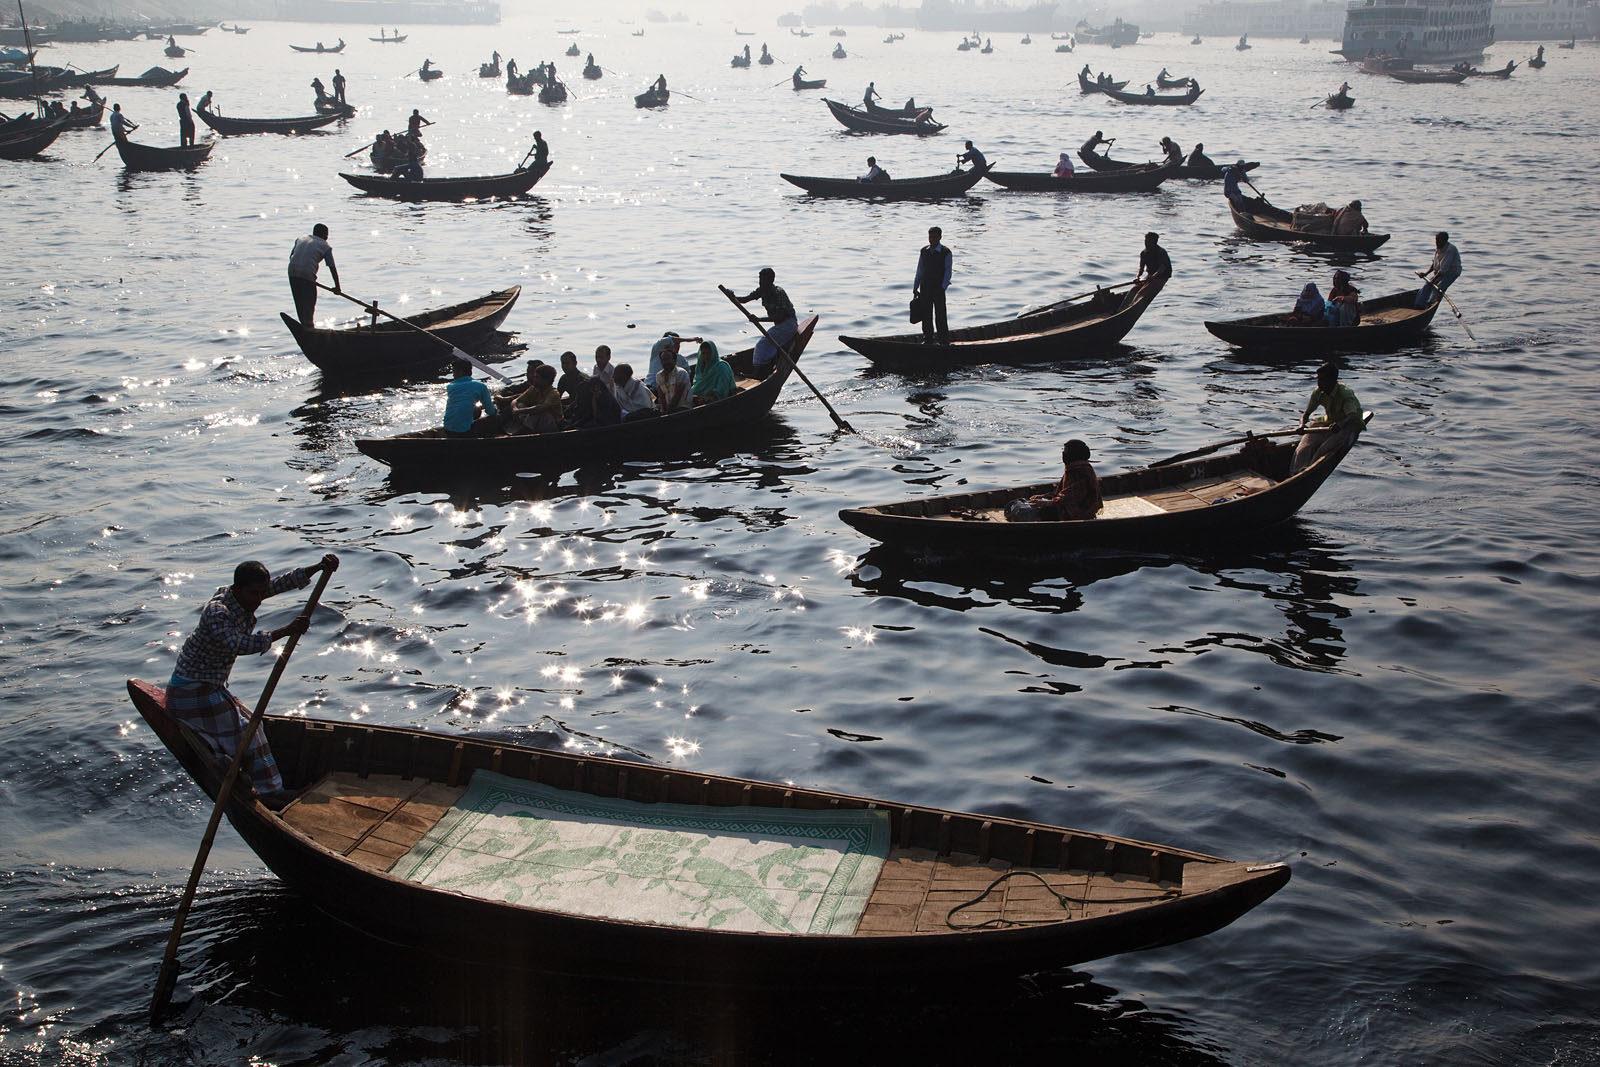 bangladesh_dhaka_buriganga_river_boats_transport_view-1600x1067.jpg